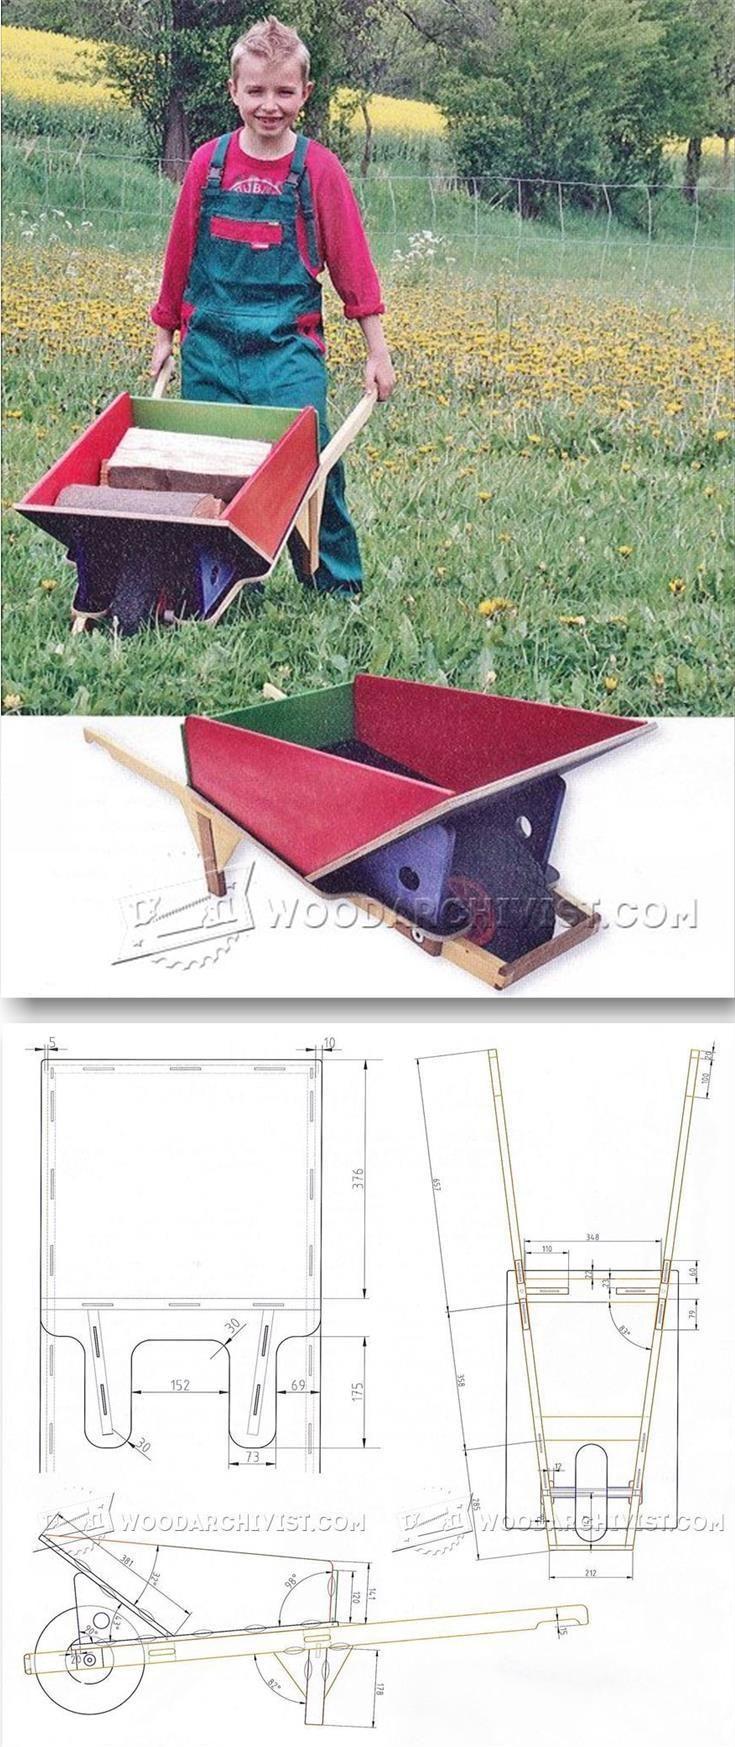 Diy Childrens Garden Cart Children S Outdoor Plans And Projects Woodarchivist Com Woodworking For Kids Kids Wooden Toys Children S Garden